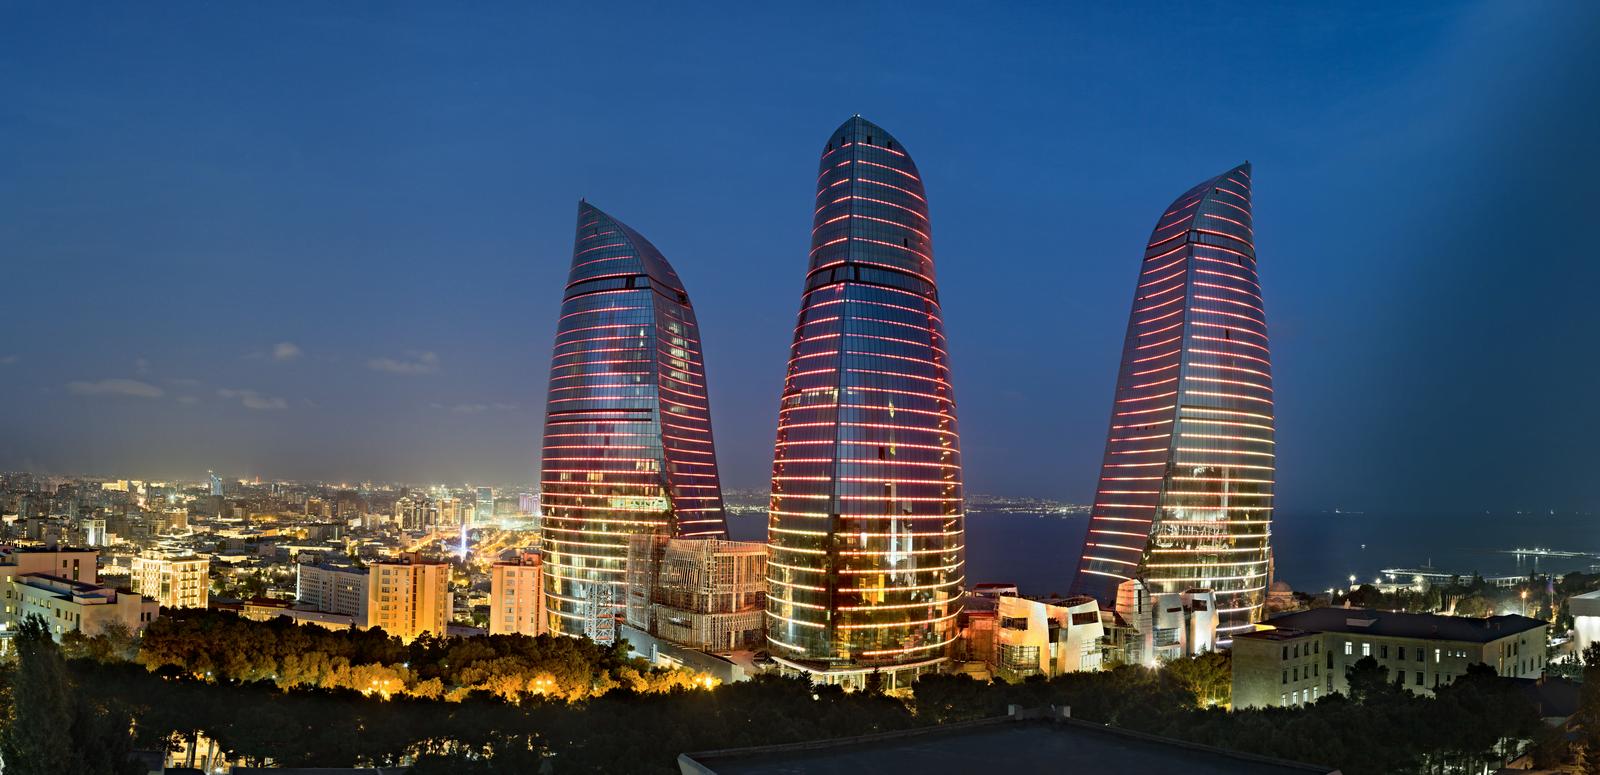 Flame tower Azerbaijan